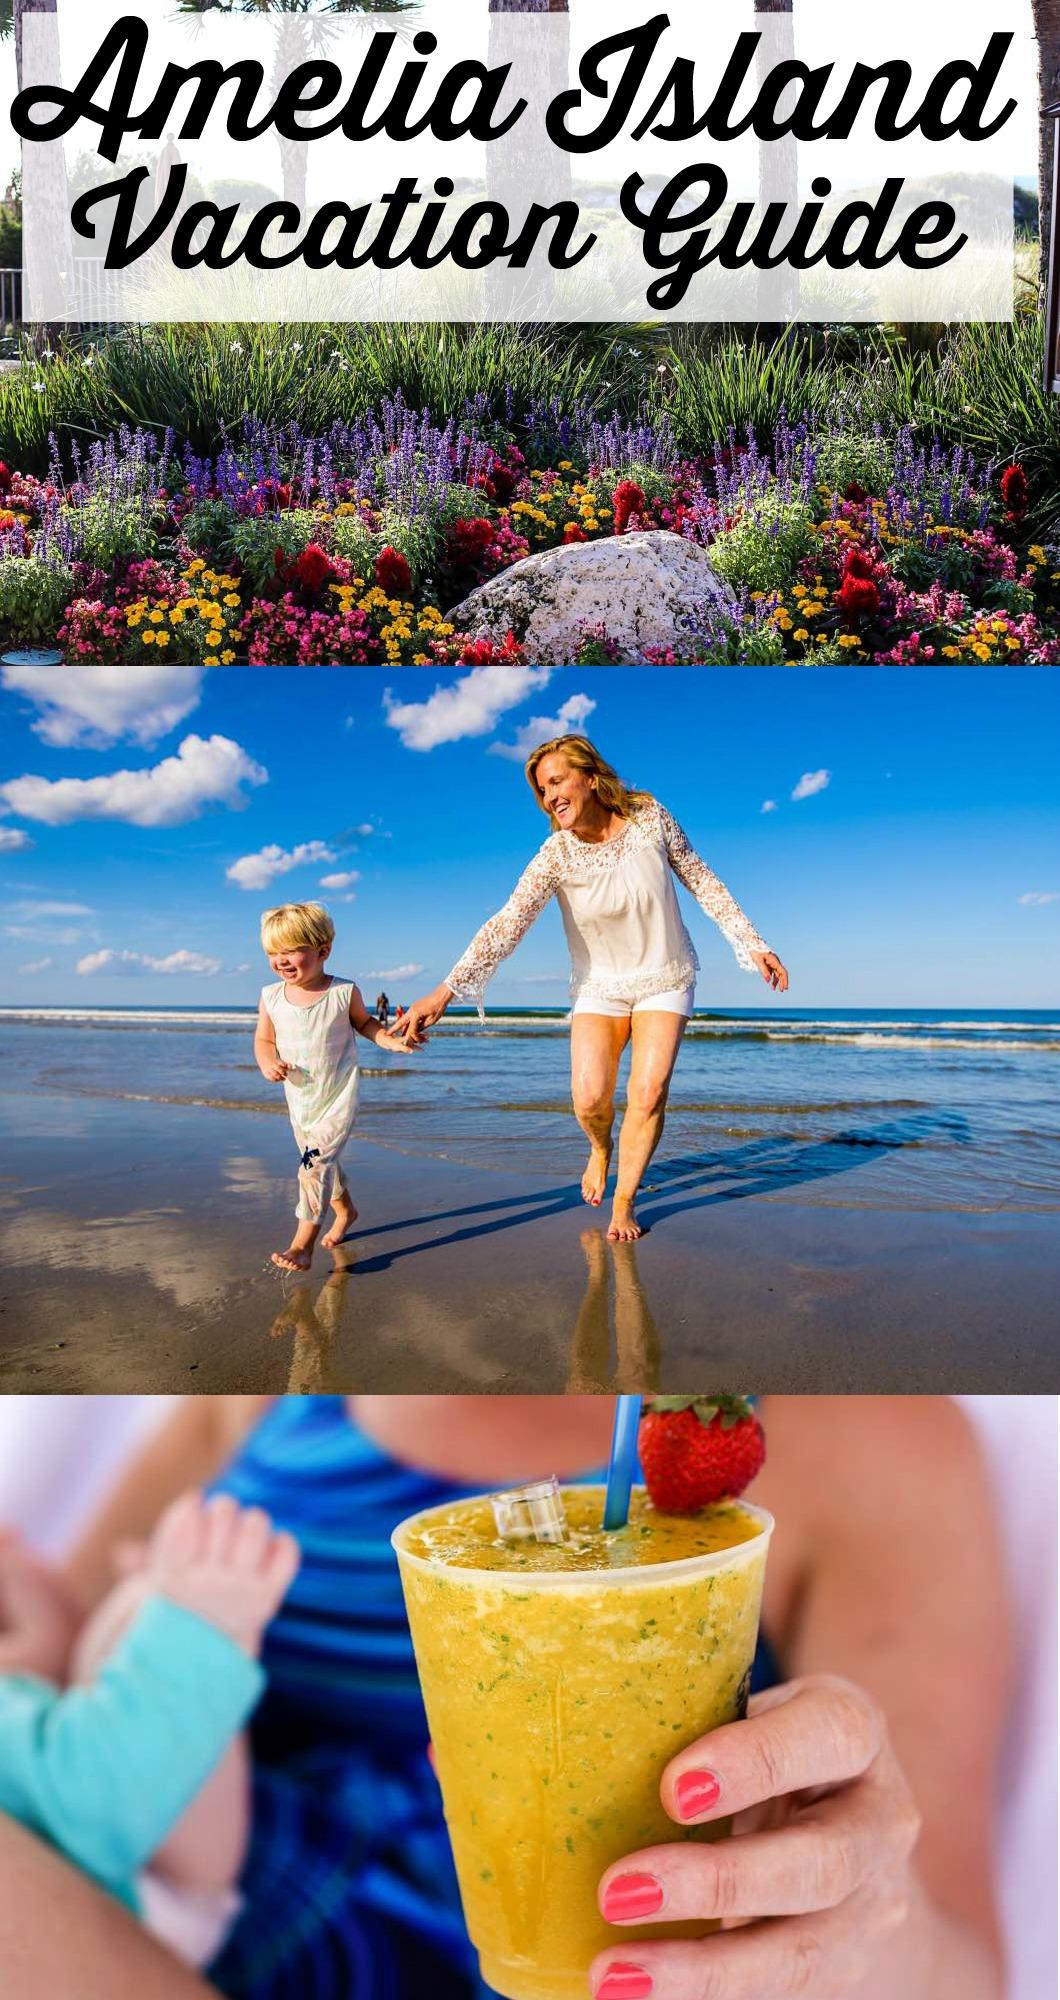 Amelia Island Vacation